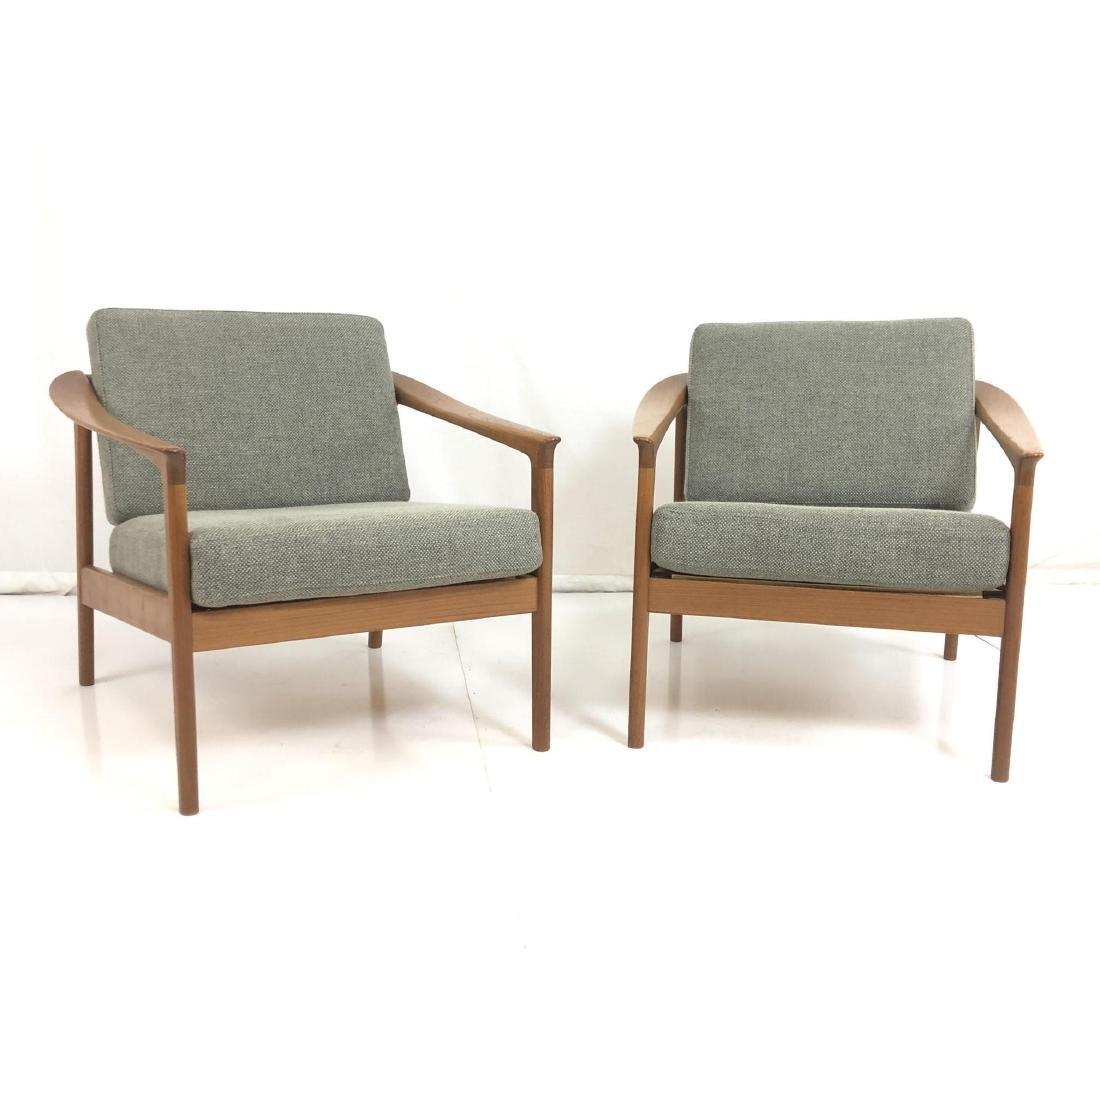 Pr FOLKE OHLSSON Danish Modern Teak Lounge Chairs - 3